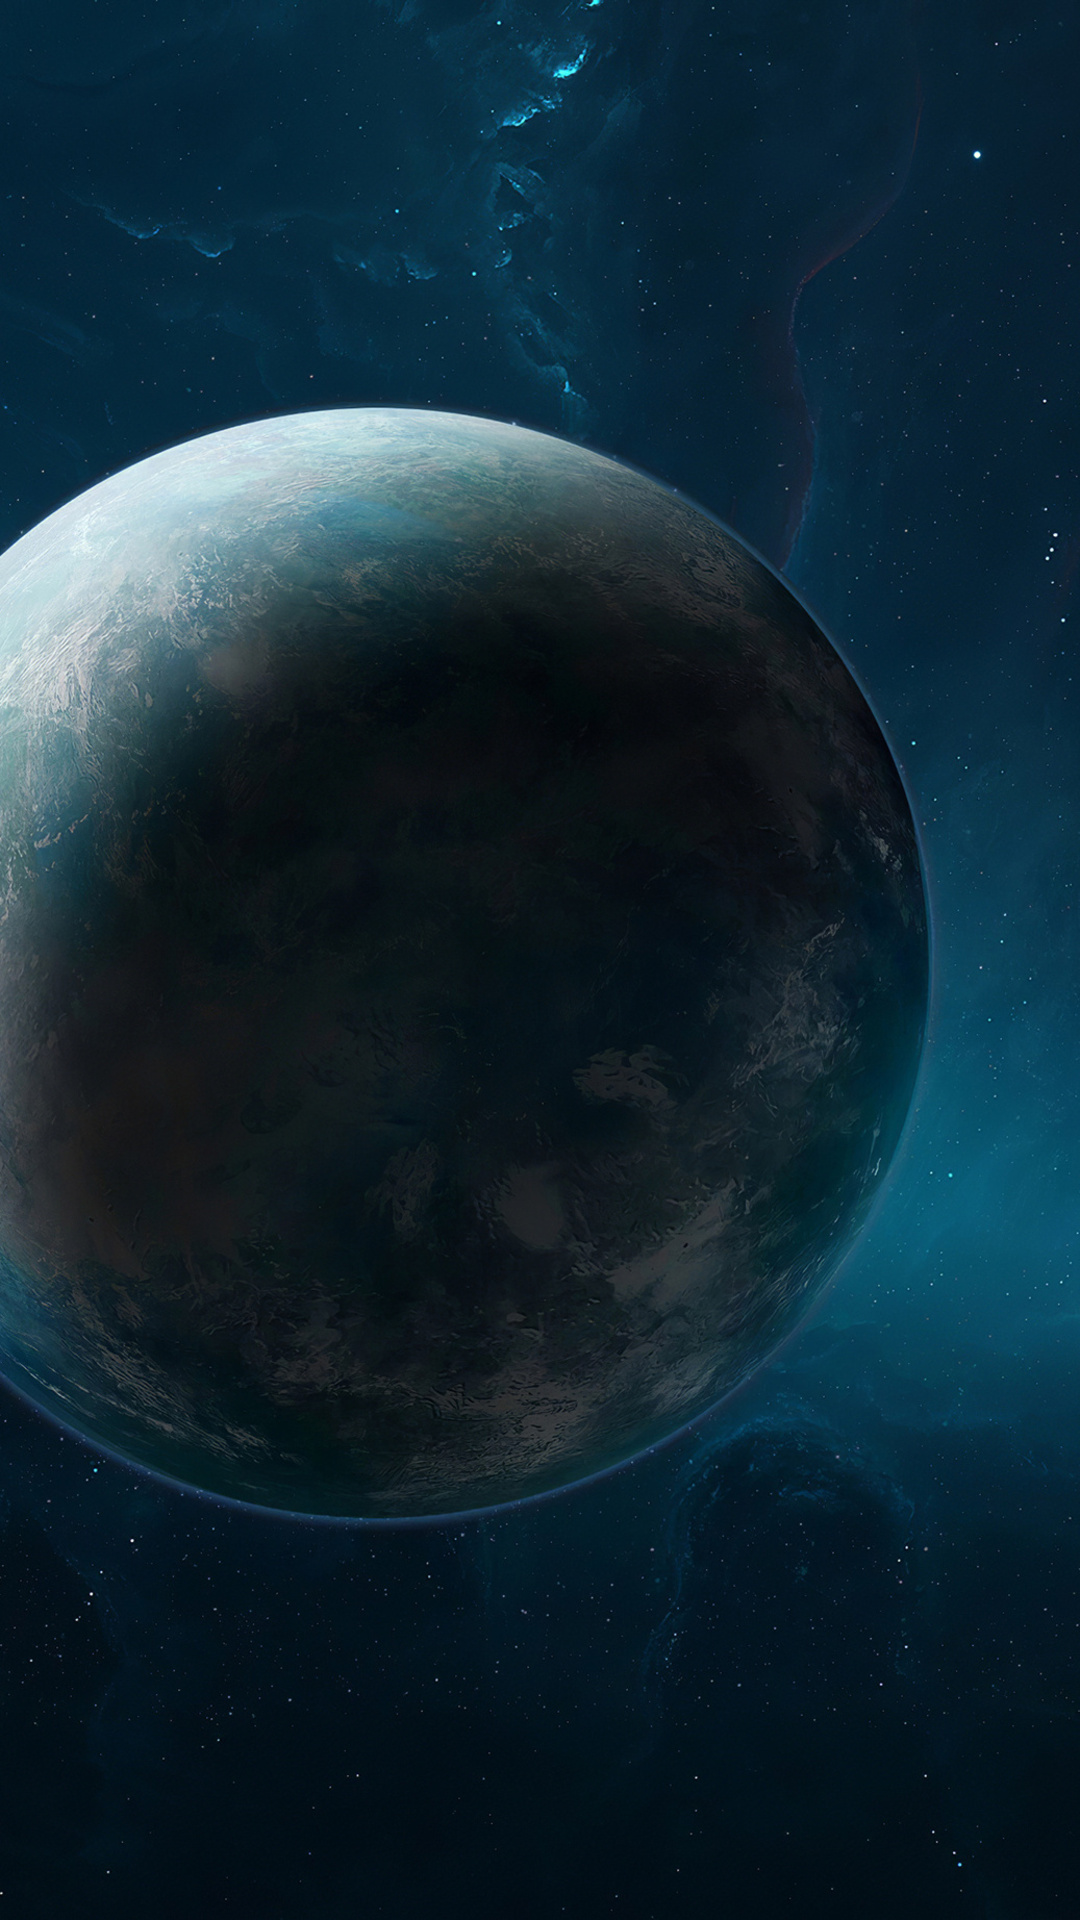 planet-space-play-4k-qw.jpg